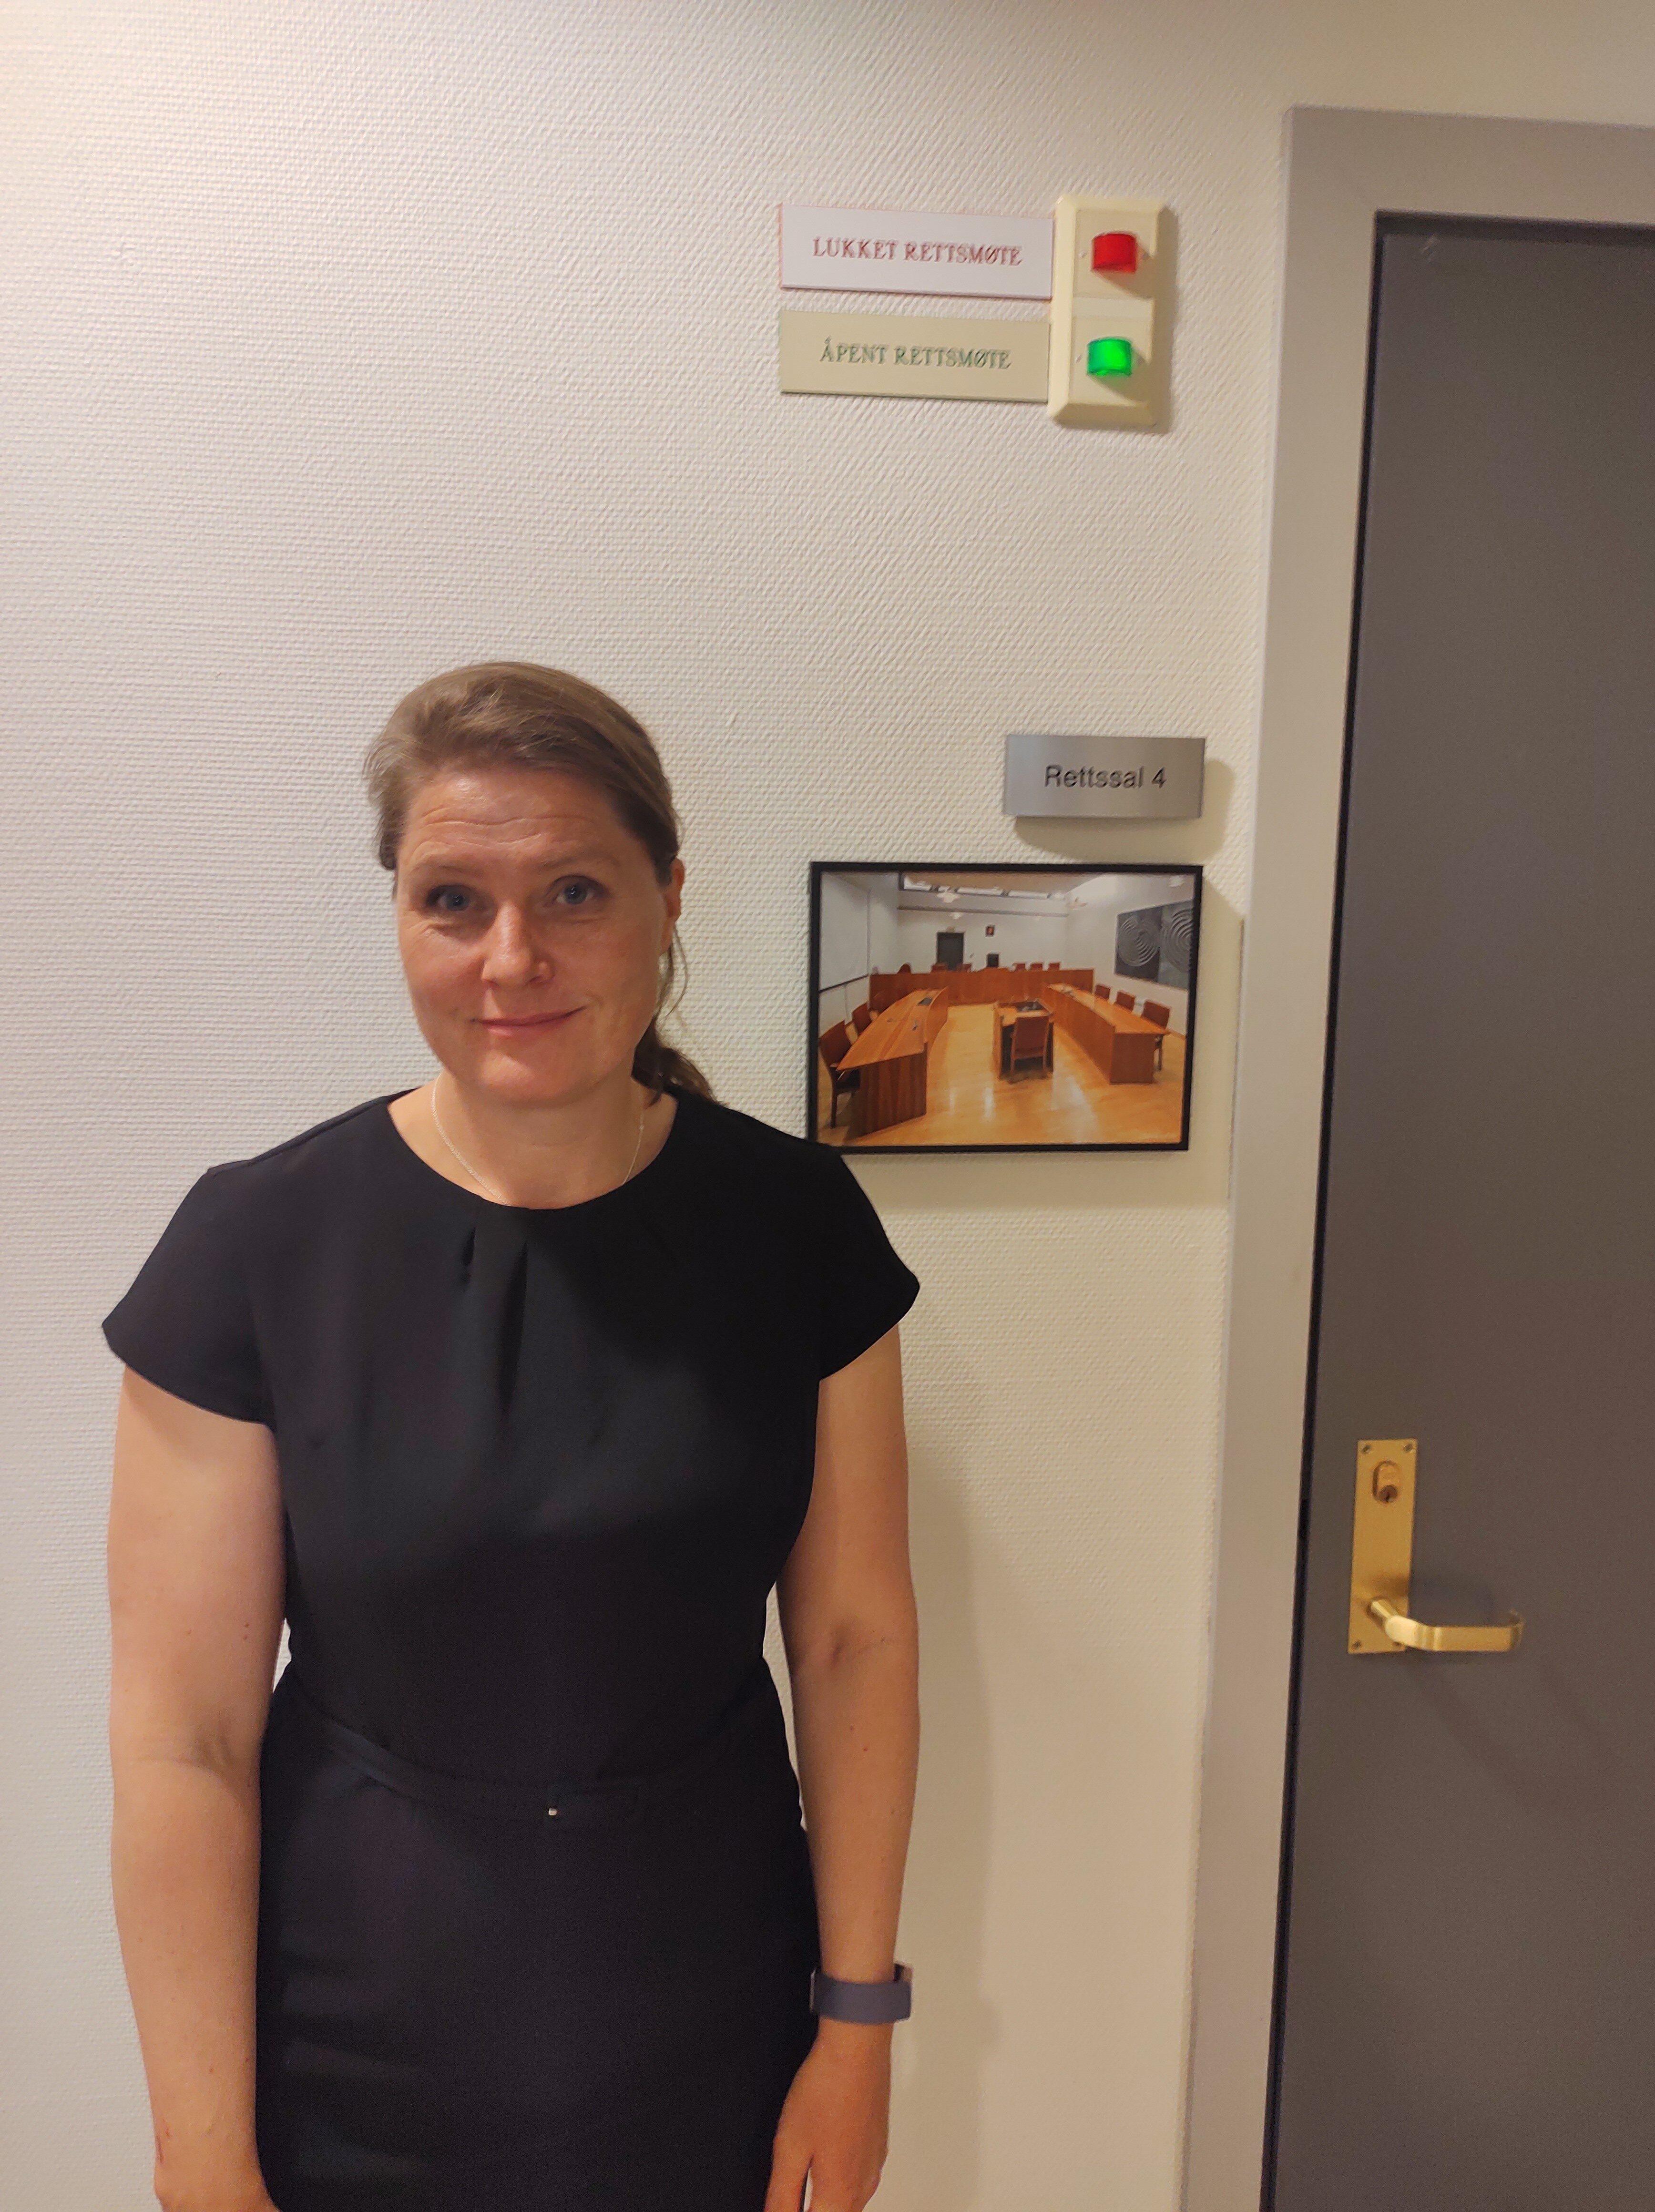 Åshild Roaldset som sakkyndig. Foto: Eva Hustoft.